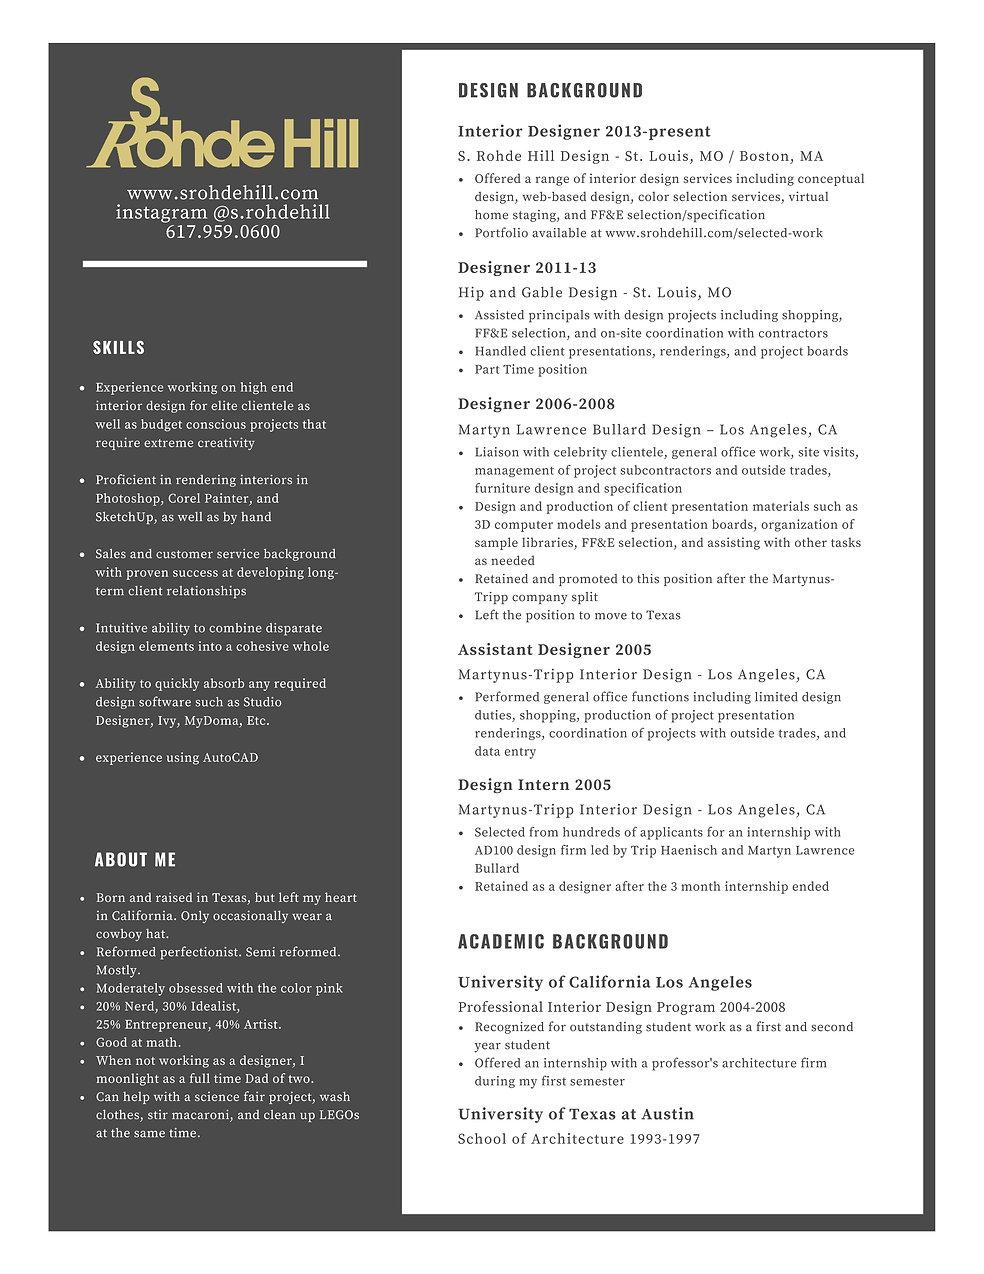 S. Rohde Hill Resume 03-2020.jpg